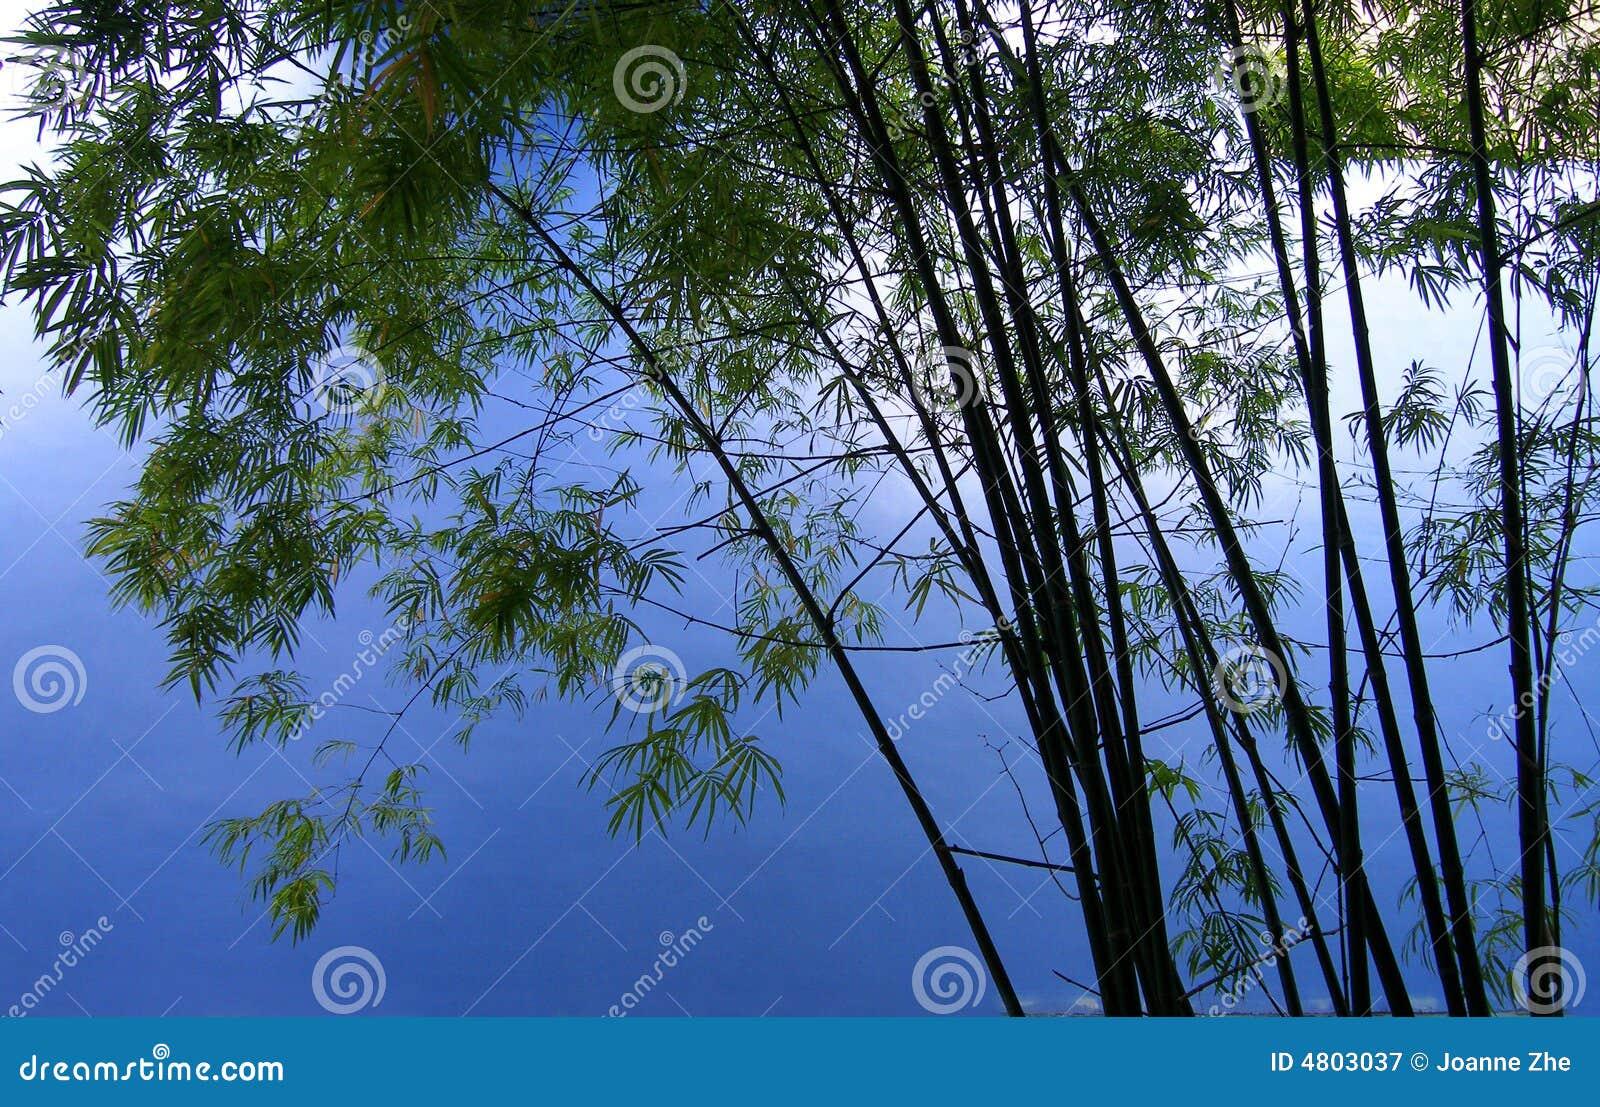 Bambudungetrees